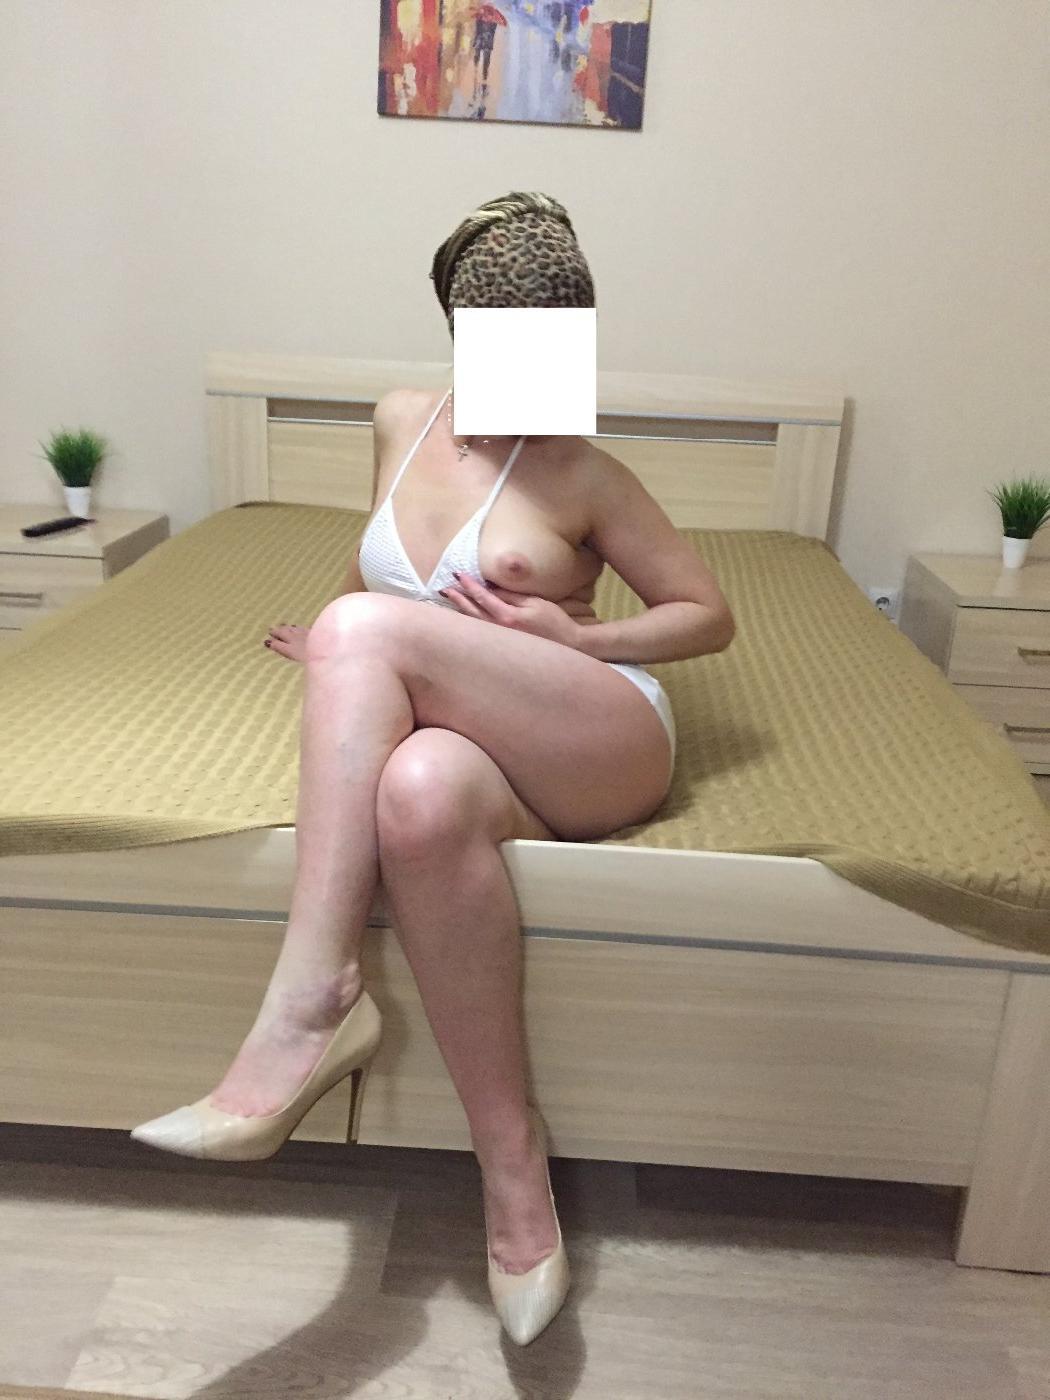 Индивидуалка Лиля, 35 лет, метро Лефортово